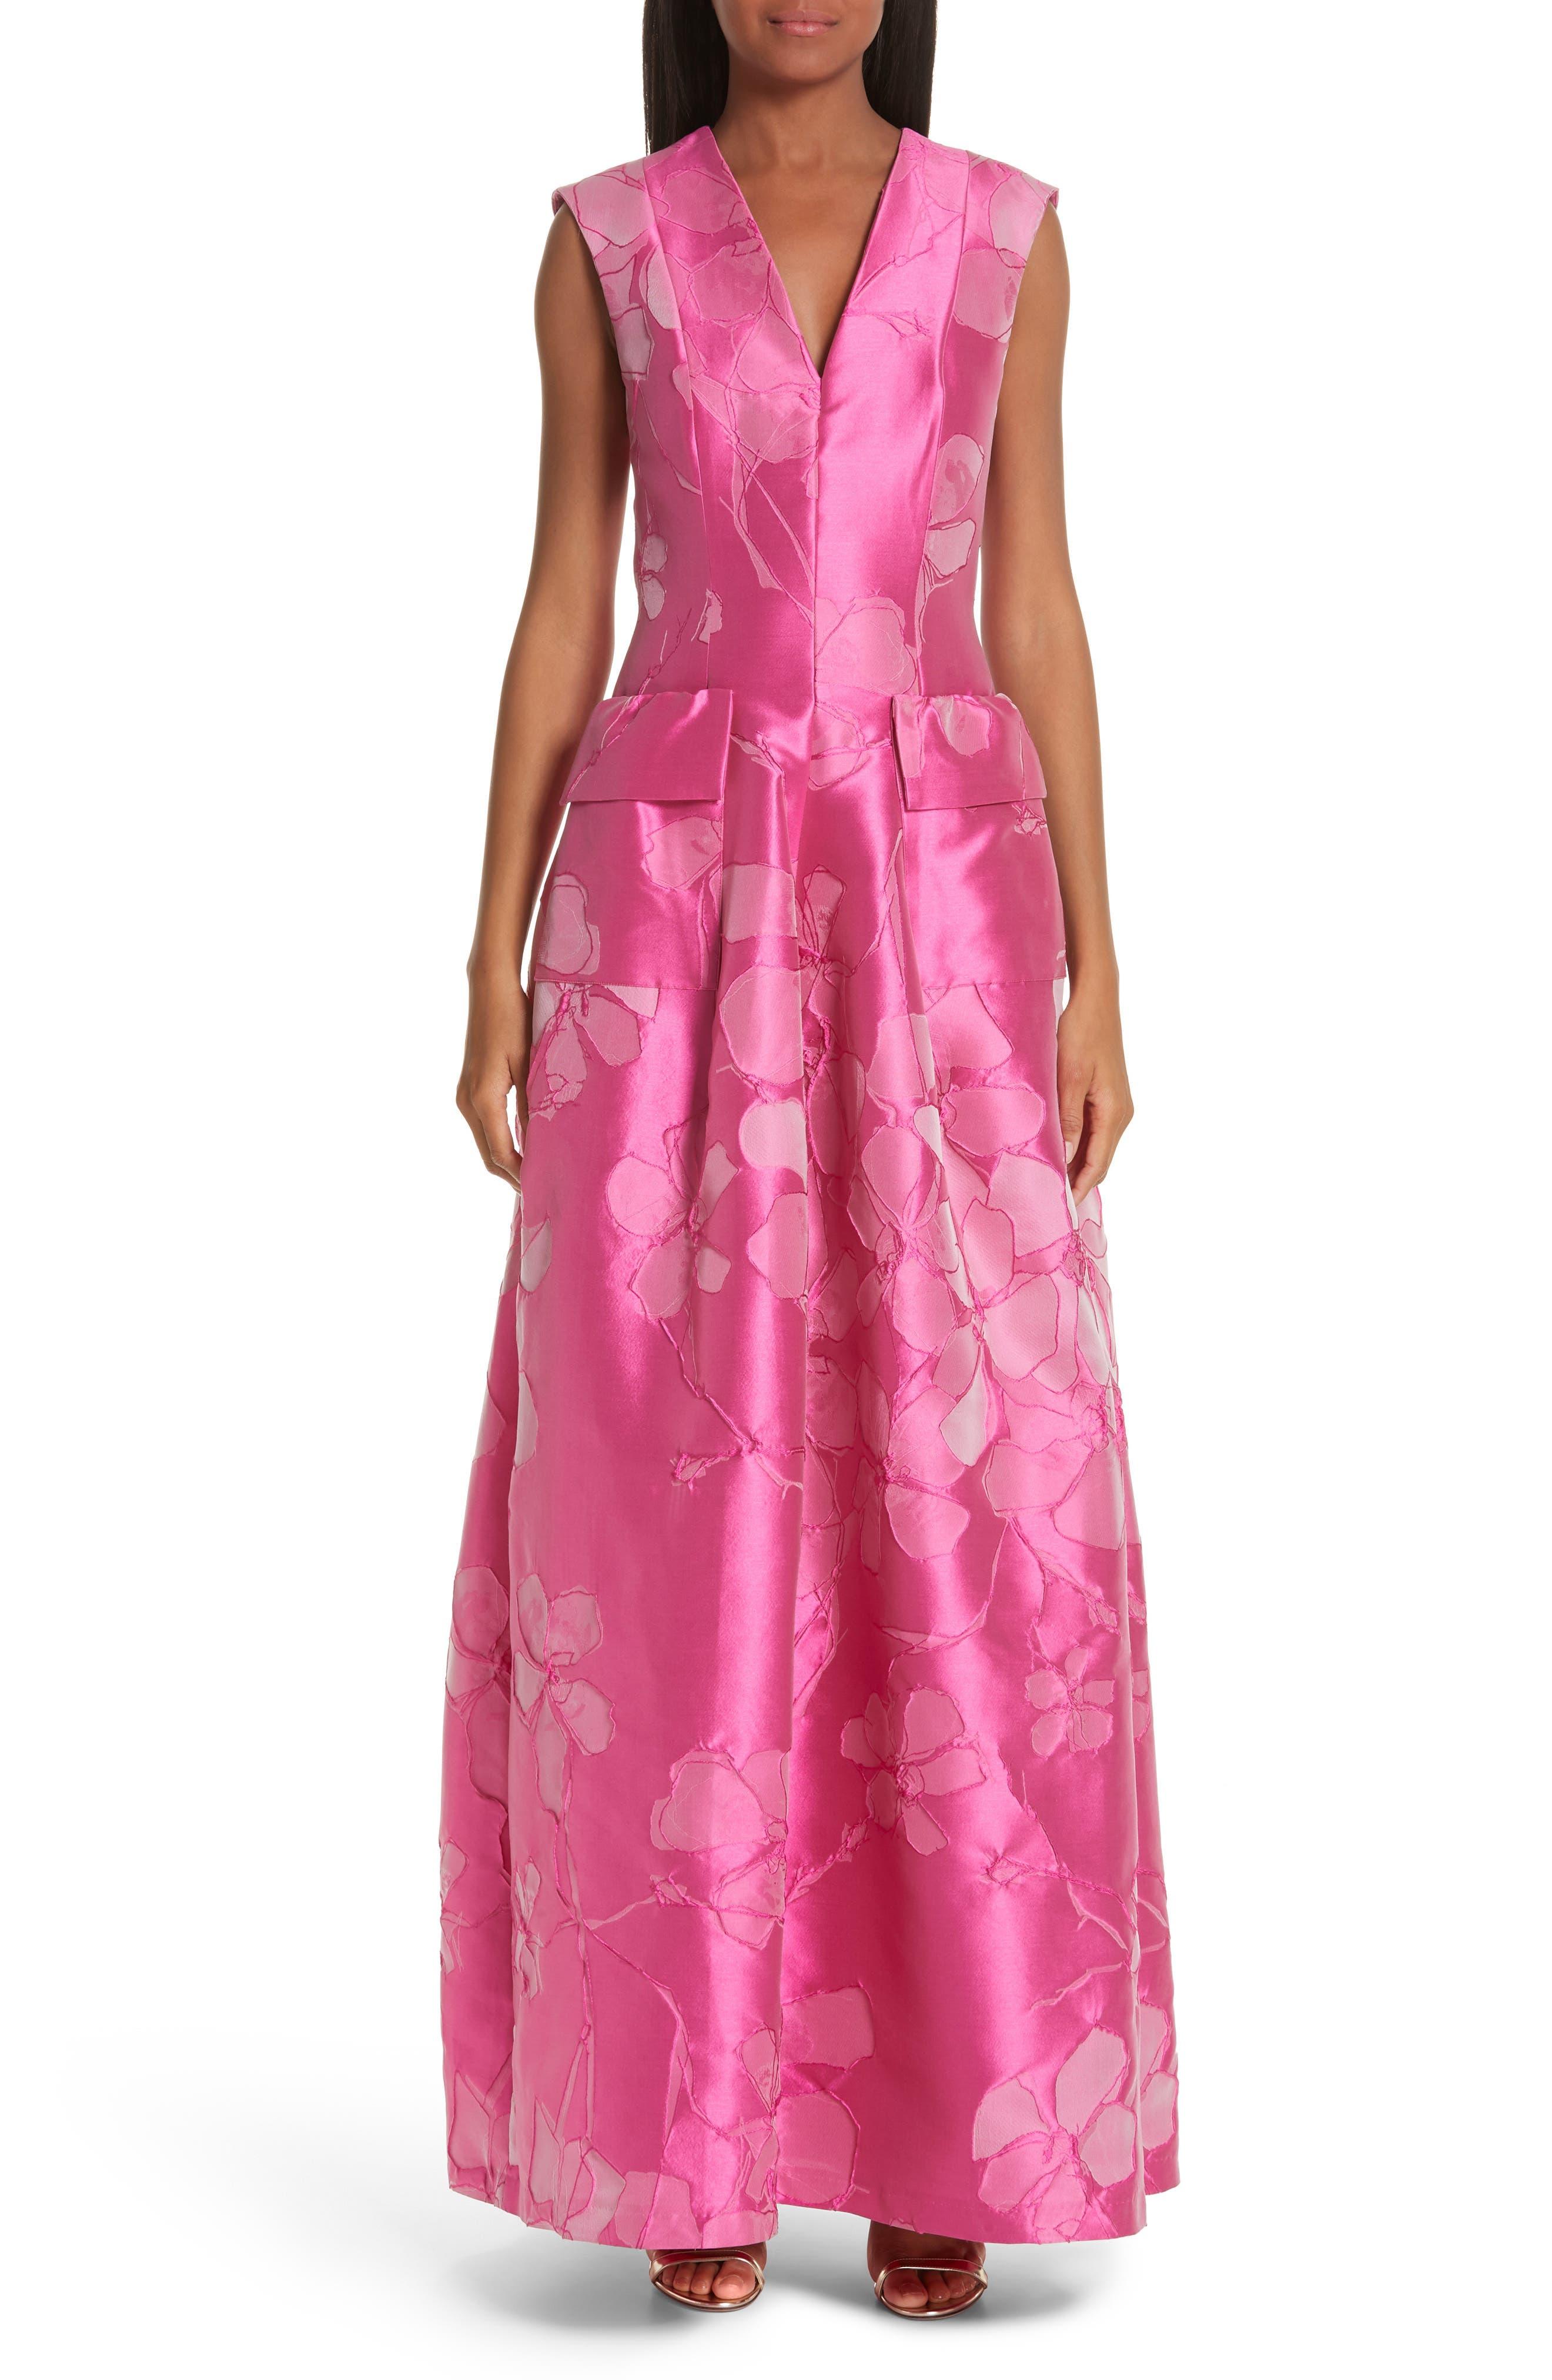 Talbot Runhof Floral V-Neck Evening Dress, Pink